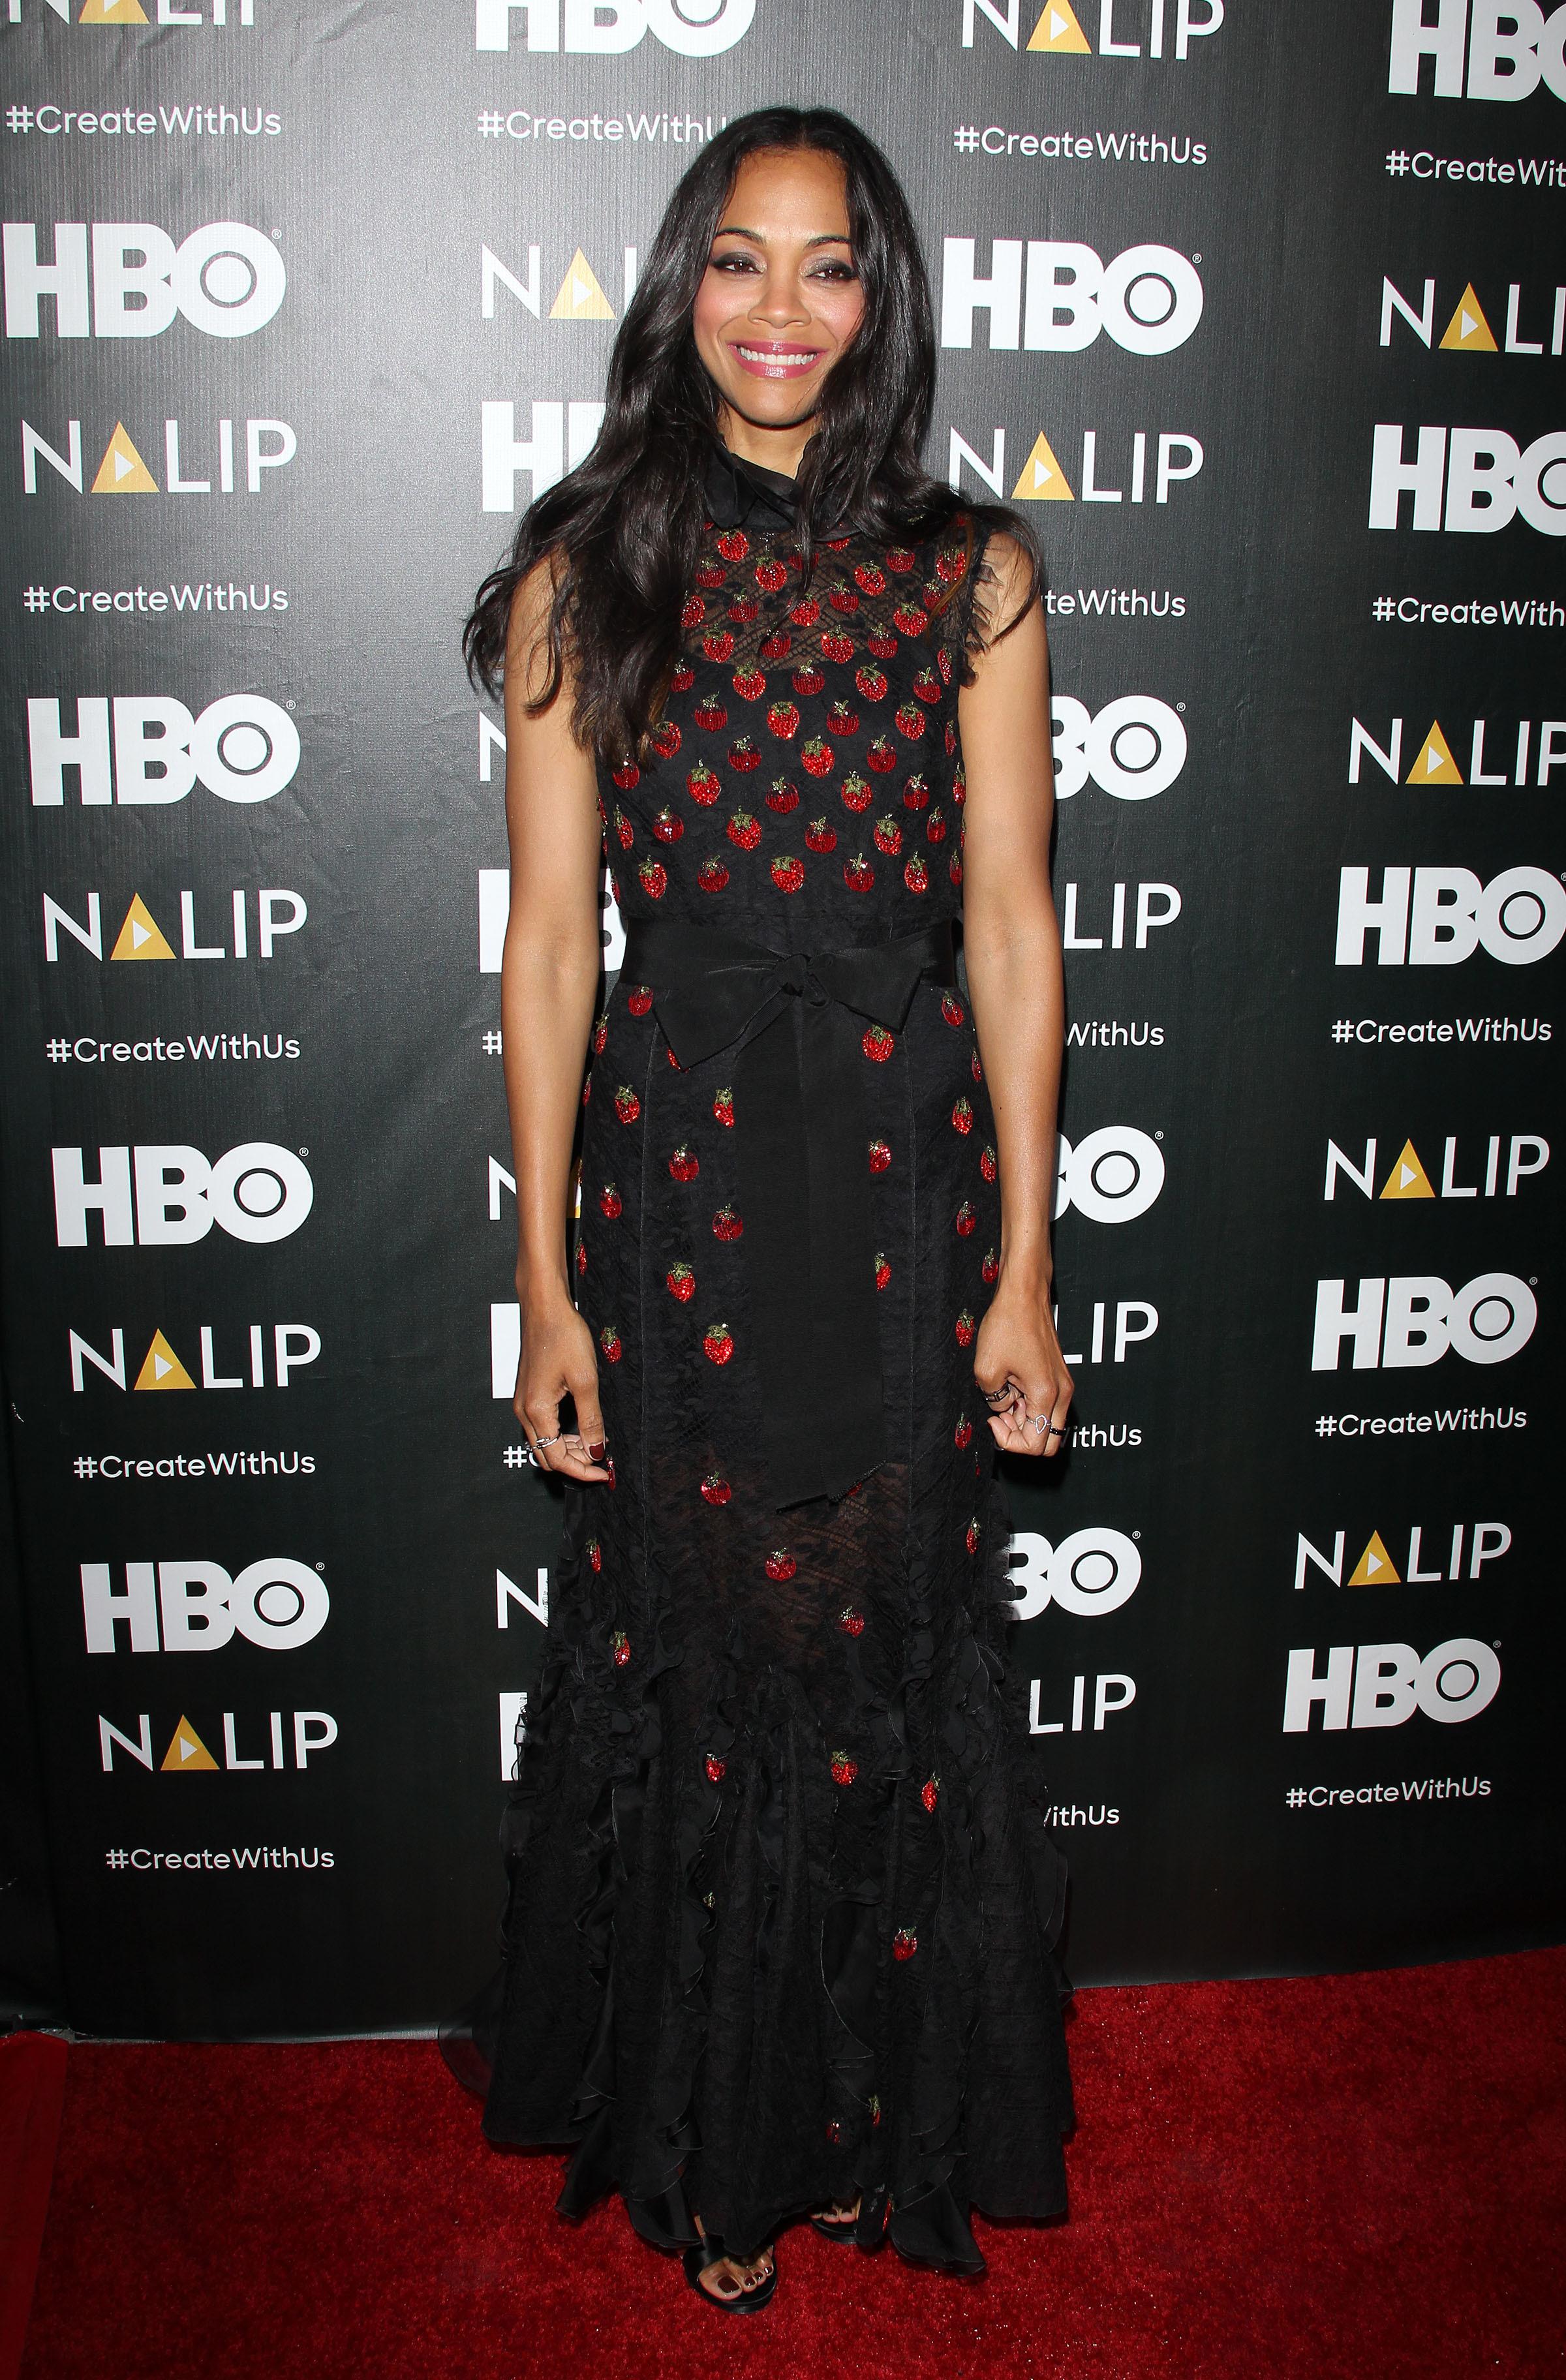 Zoe Saldana attends the NALIP Latino Media Awards in Los Angeles on June 24, 2017.